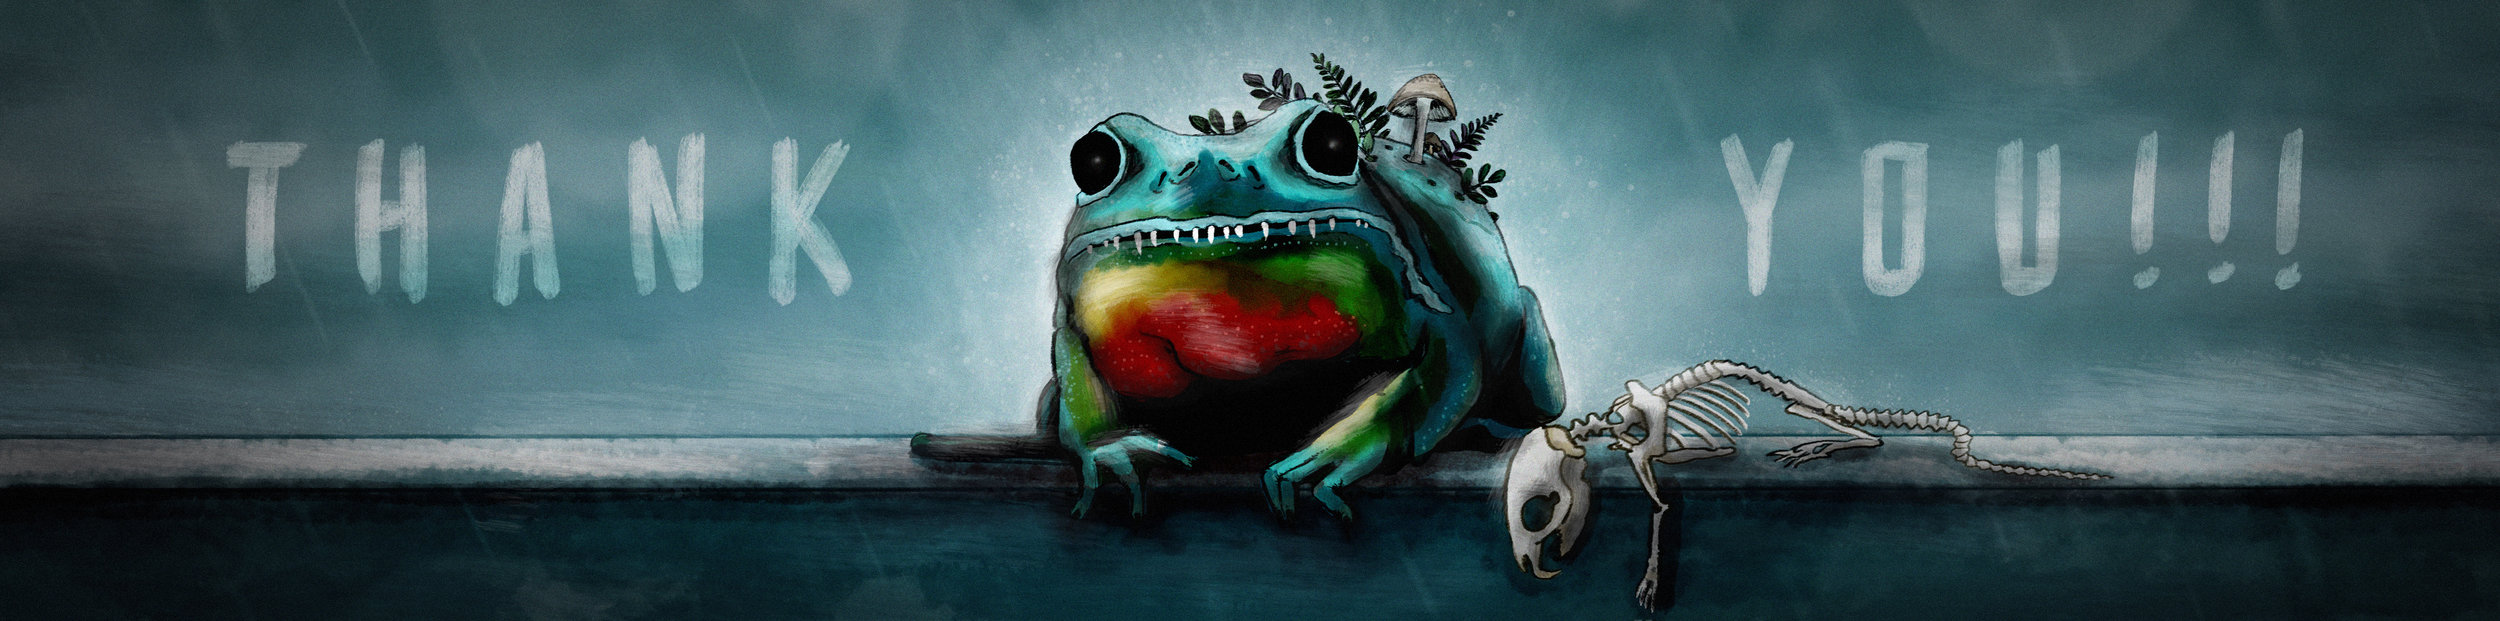 17-8-22 banner frog paint7 text.jpg